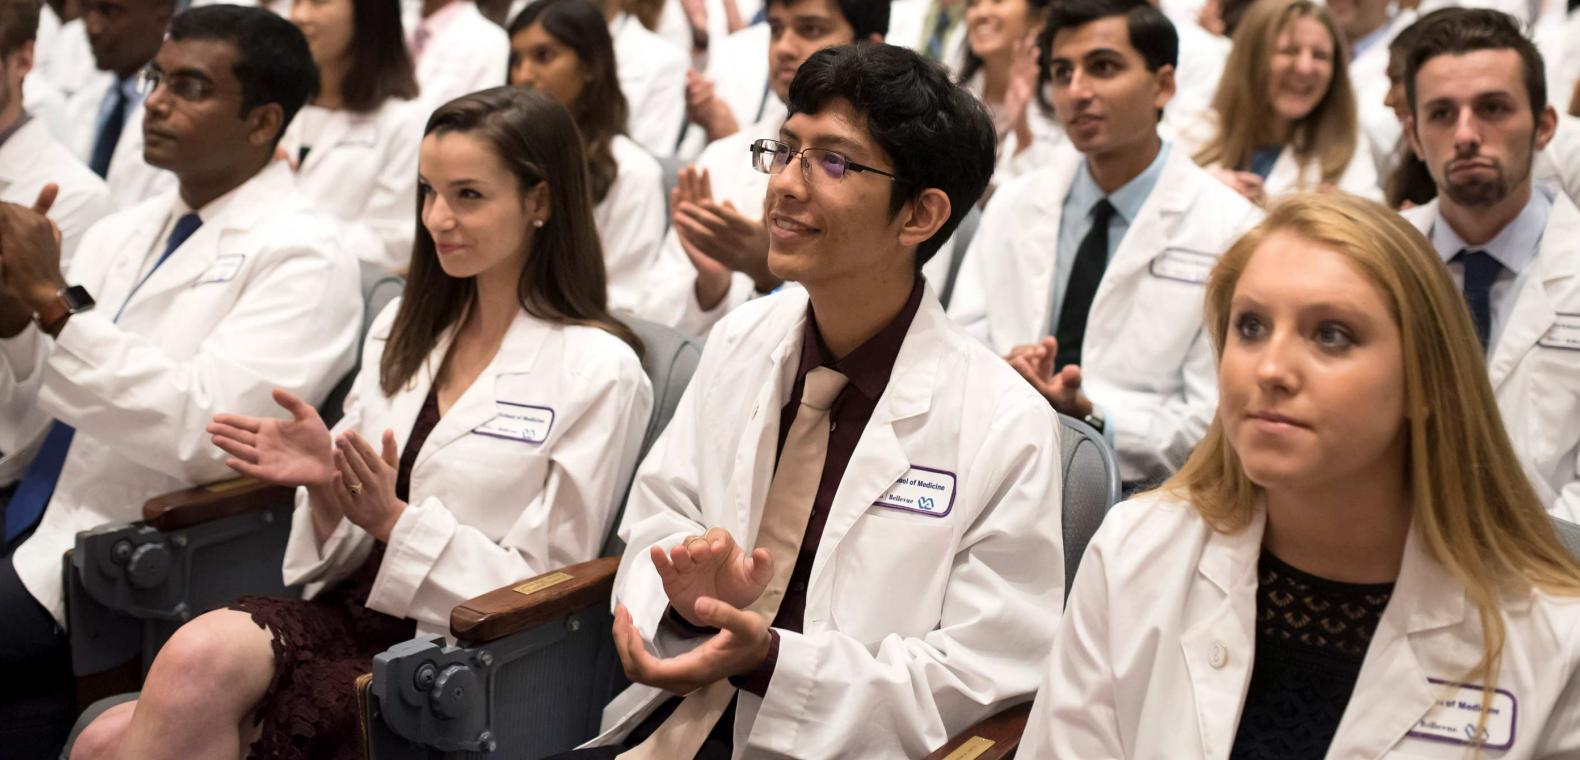 Education | NYU School of Medicine | NYU Langone Health